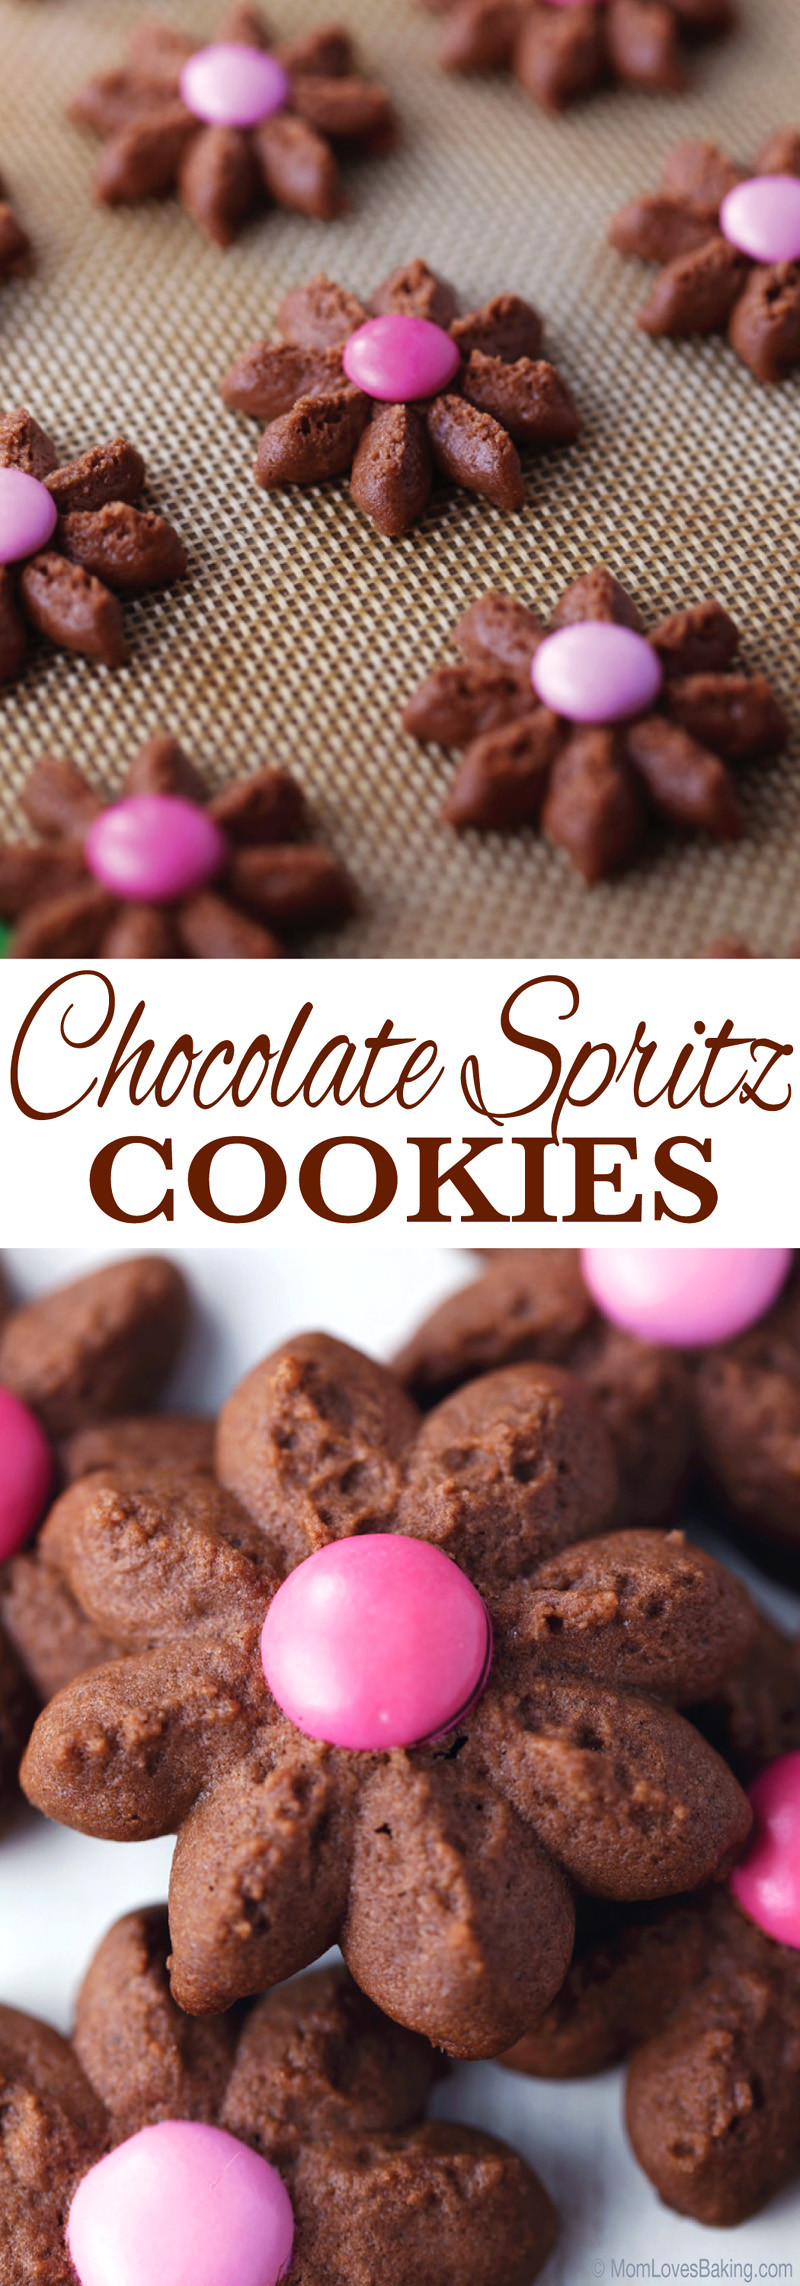 Chocolate Spritz Cookies  Chocolate Spritz Cookies Mom Loves Baking